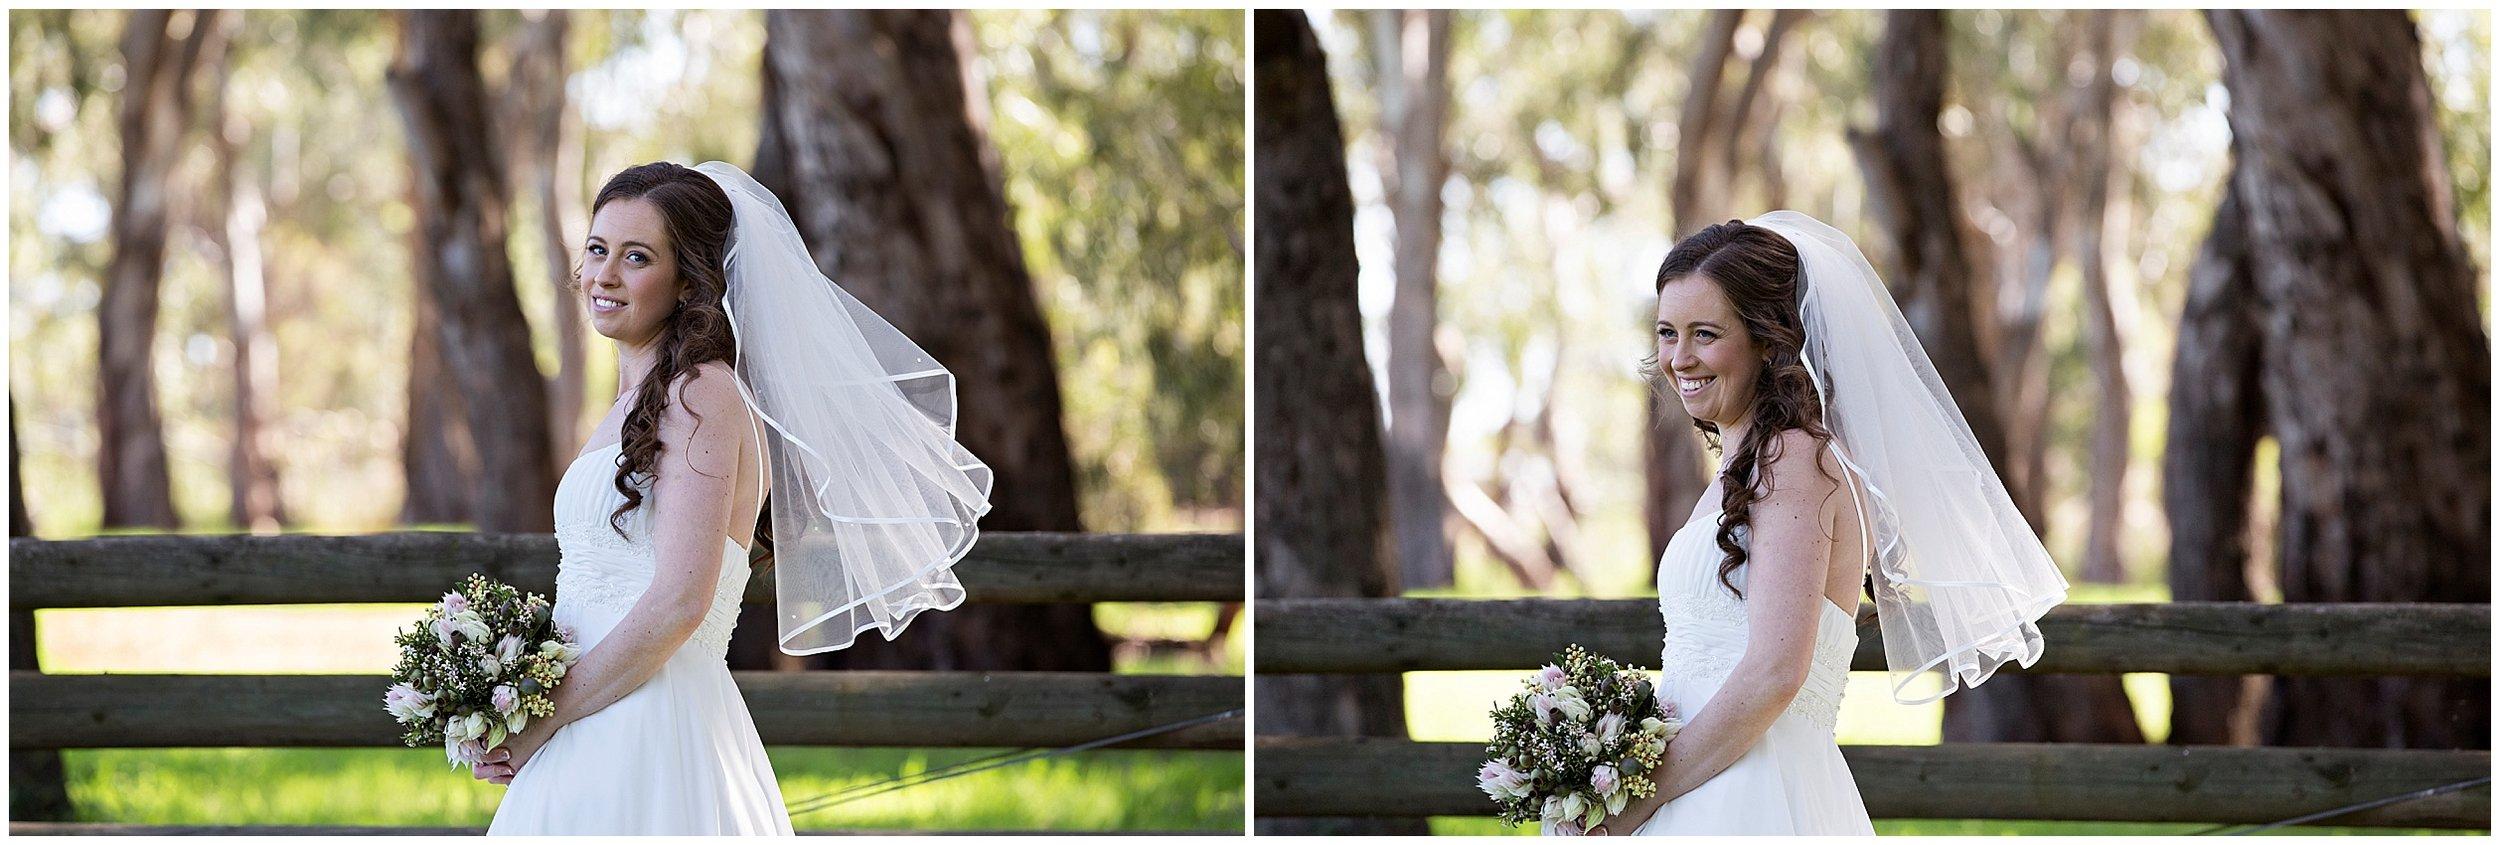 shepparton-wedding-photographer_0063.jpg